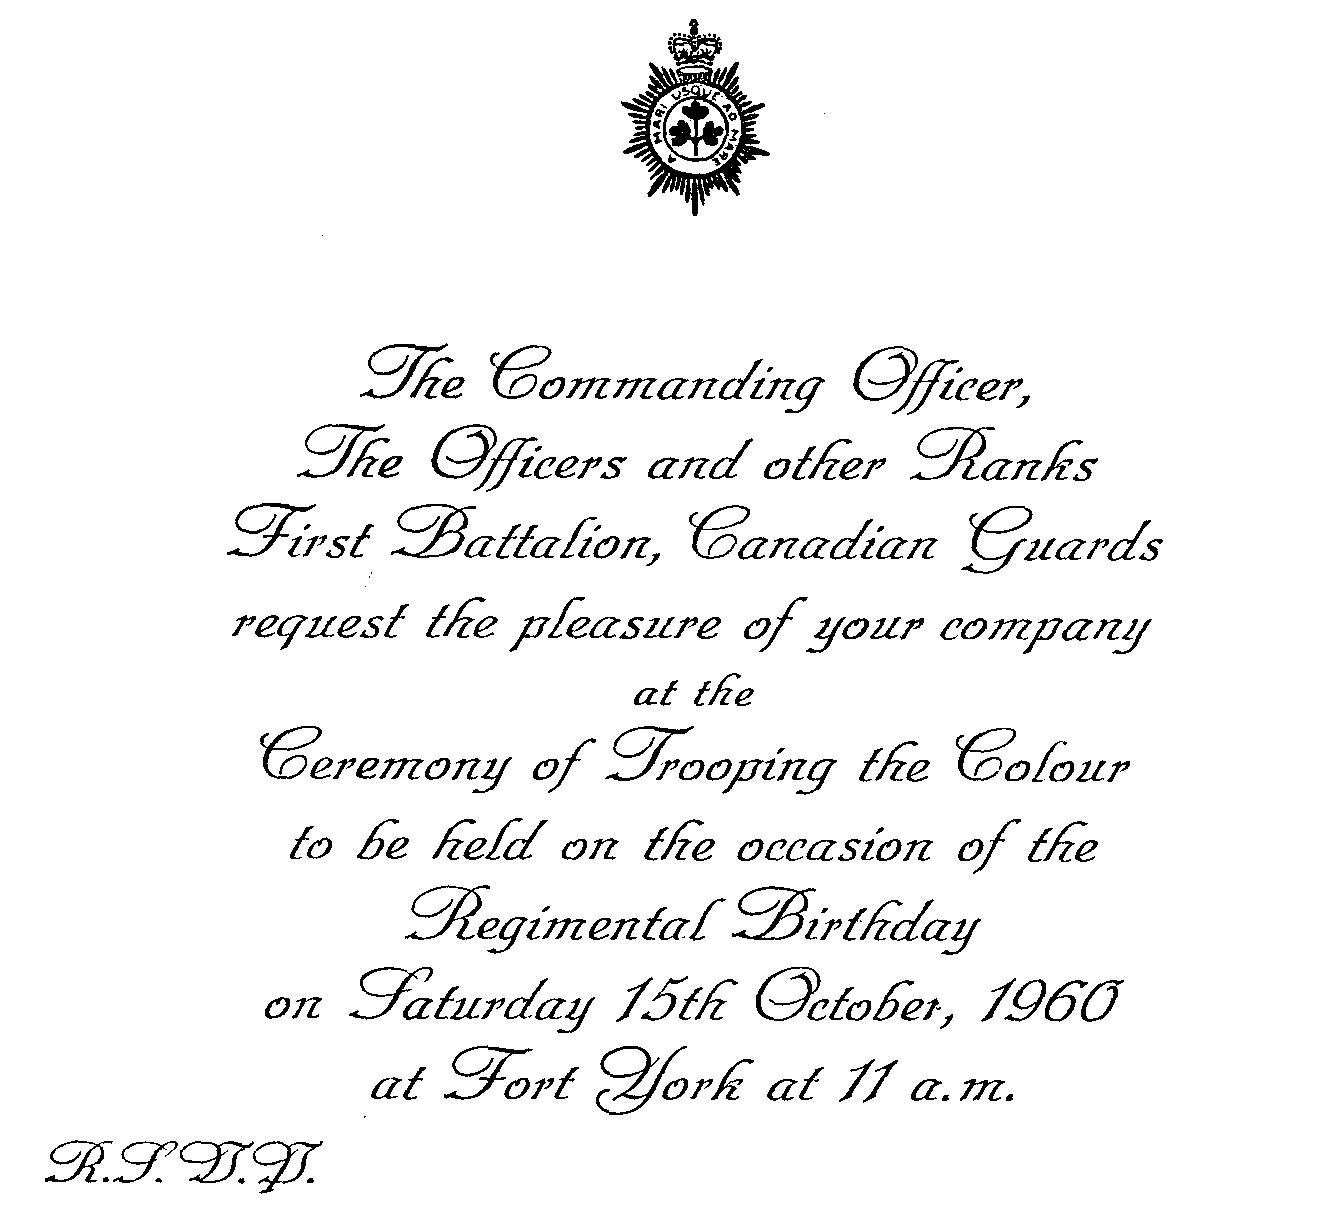 43_Cdn Gds-Trooping Colour on 15 Oct 1960-Invitation